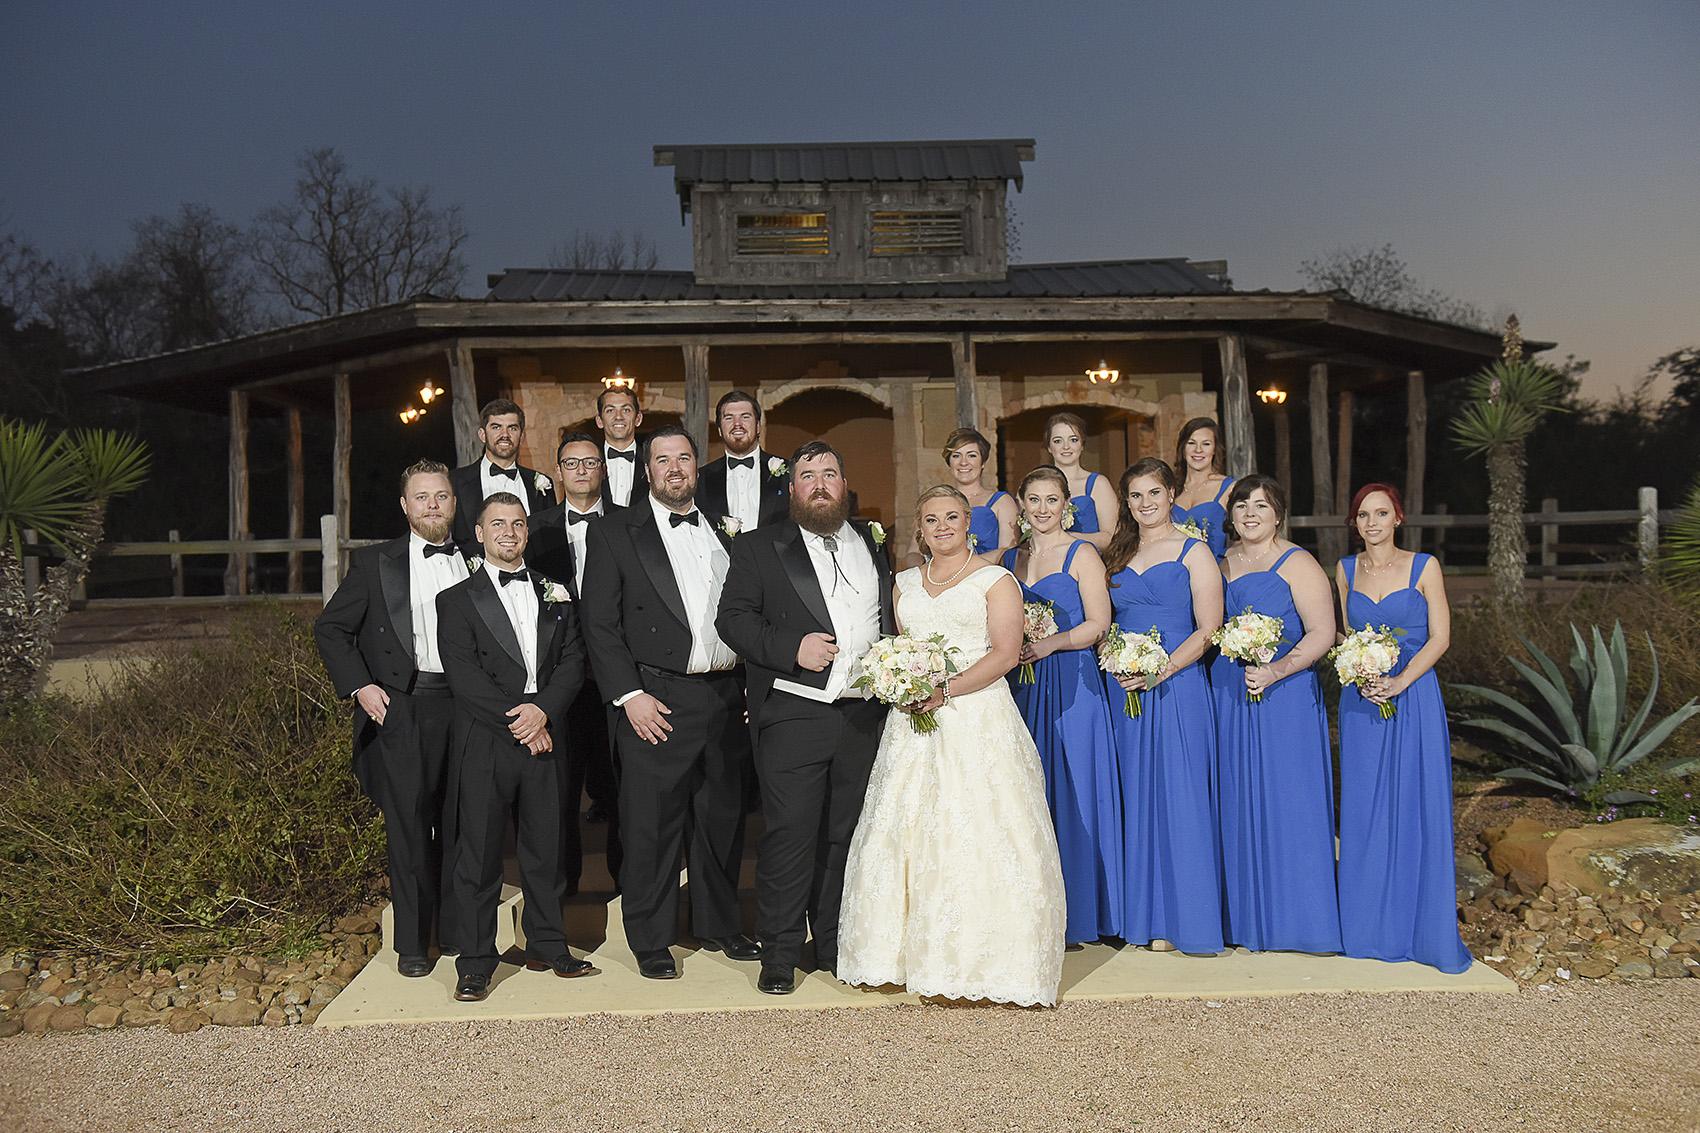 tomball-wedding-venue-moffitt-oaks-bridal-party-formal-photo-cantina-rustic-evening